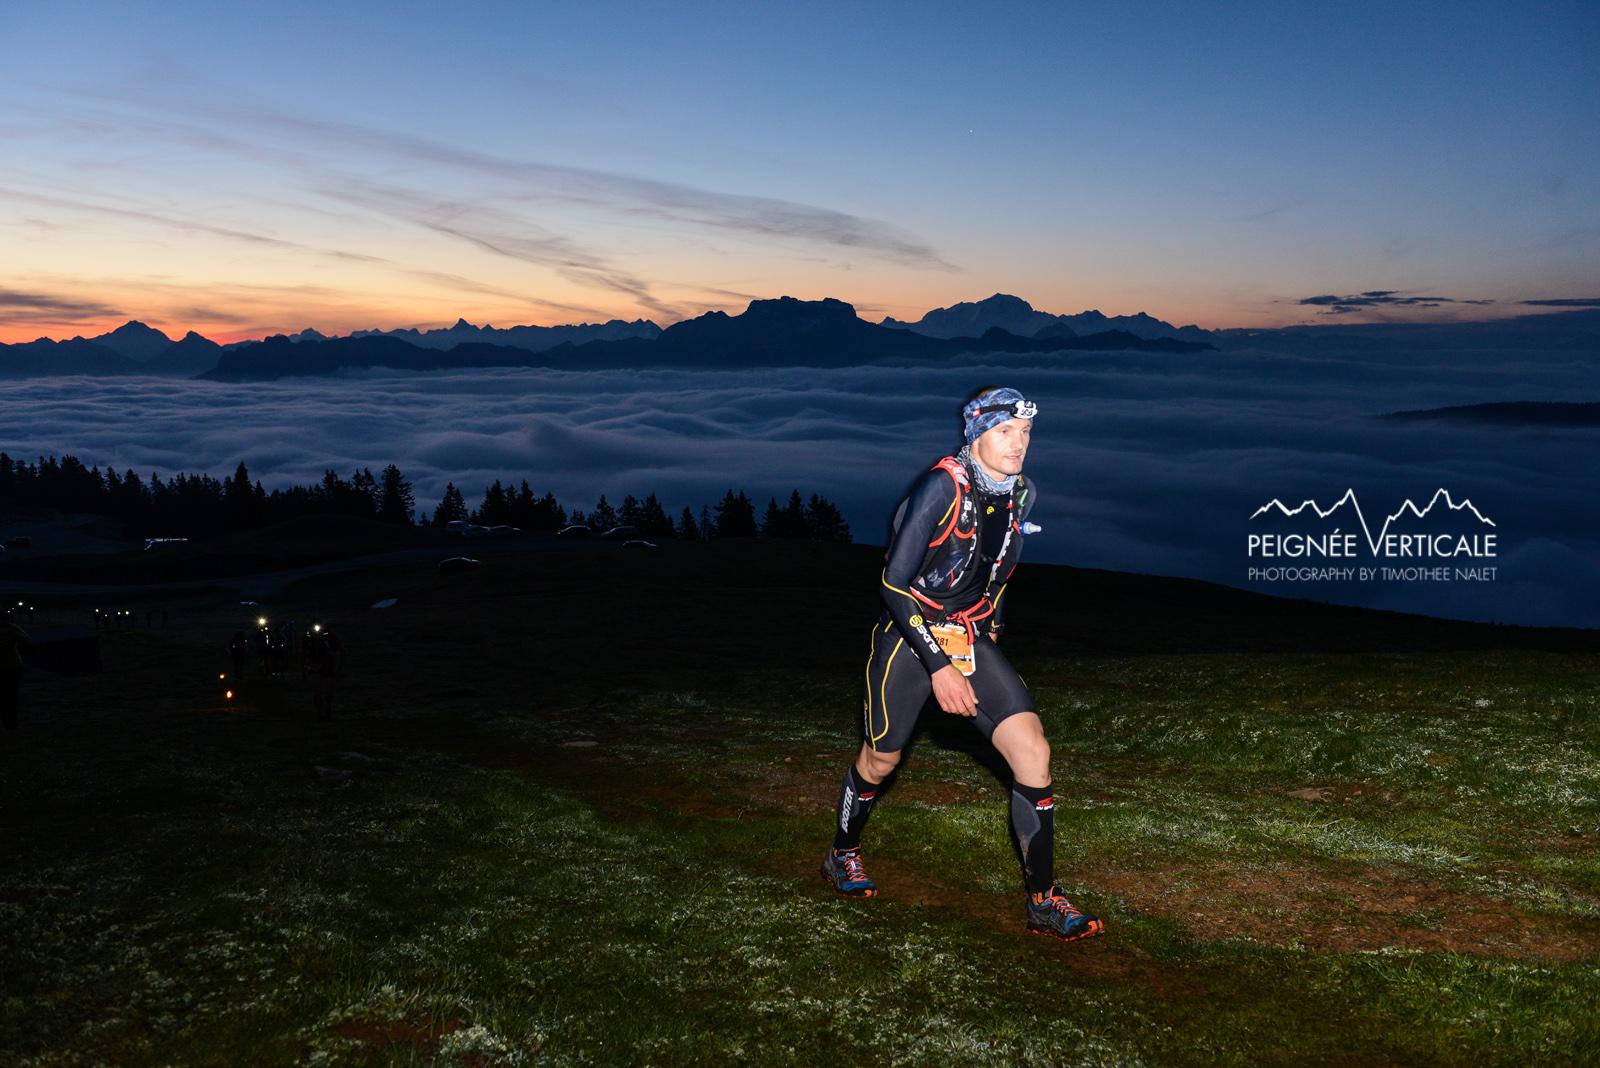 MaxiRace-Annecy-2014-Team-Hoka-Timothee-Nalet-0760.jpg